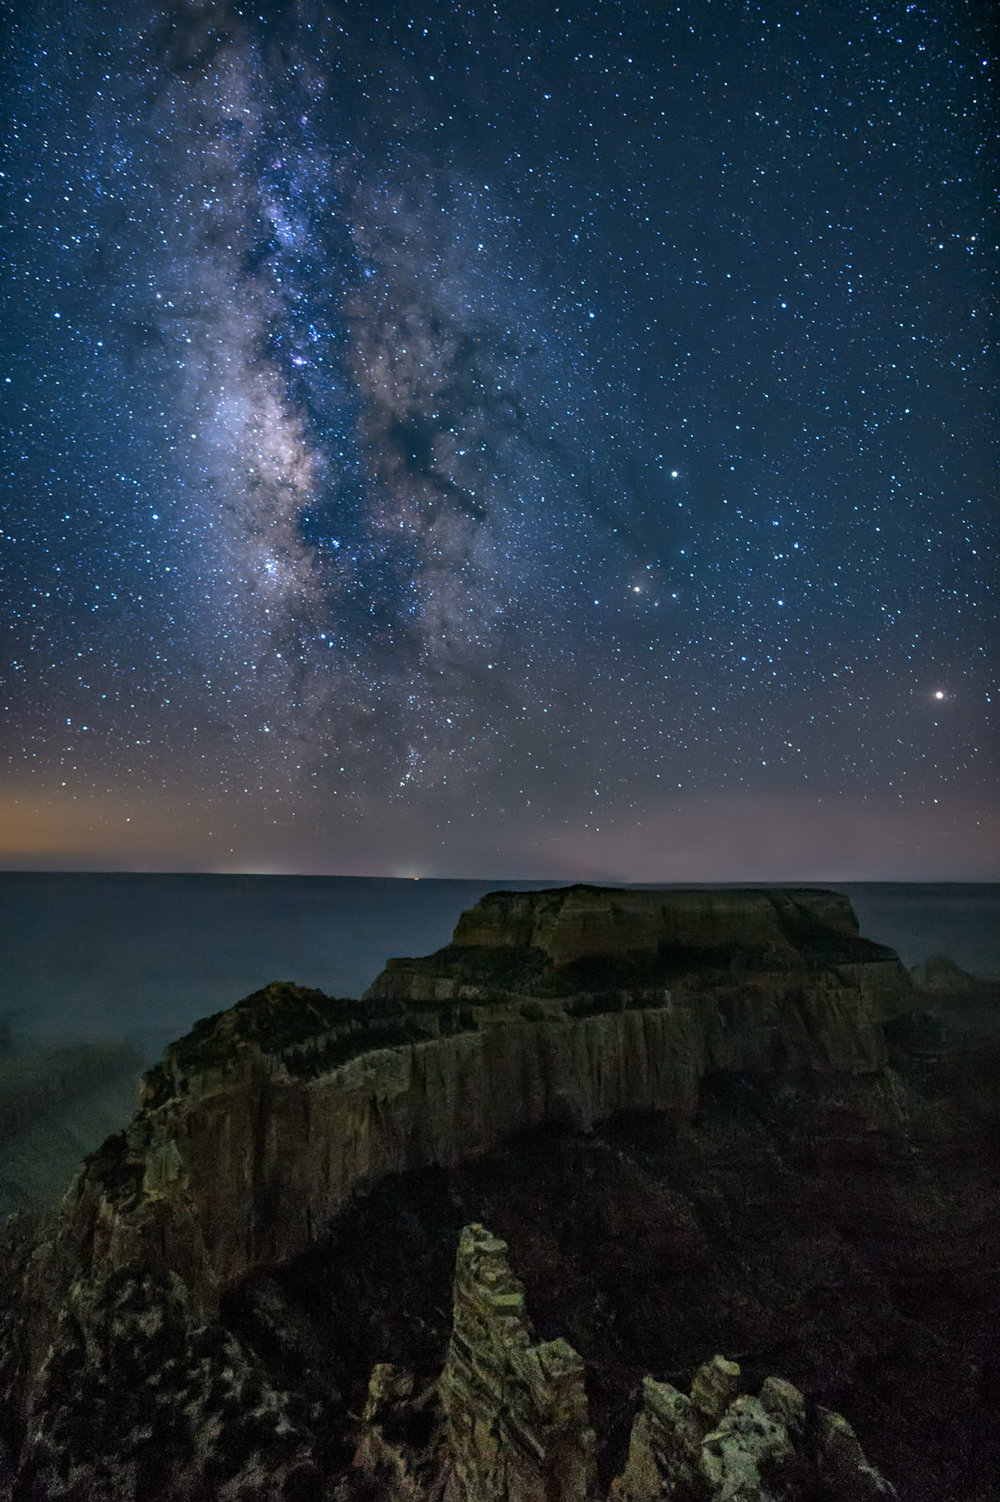 Cape Royale in a Sea of Stars